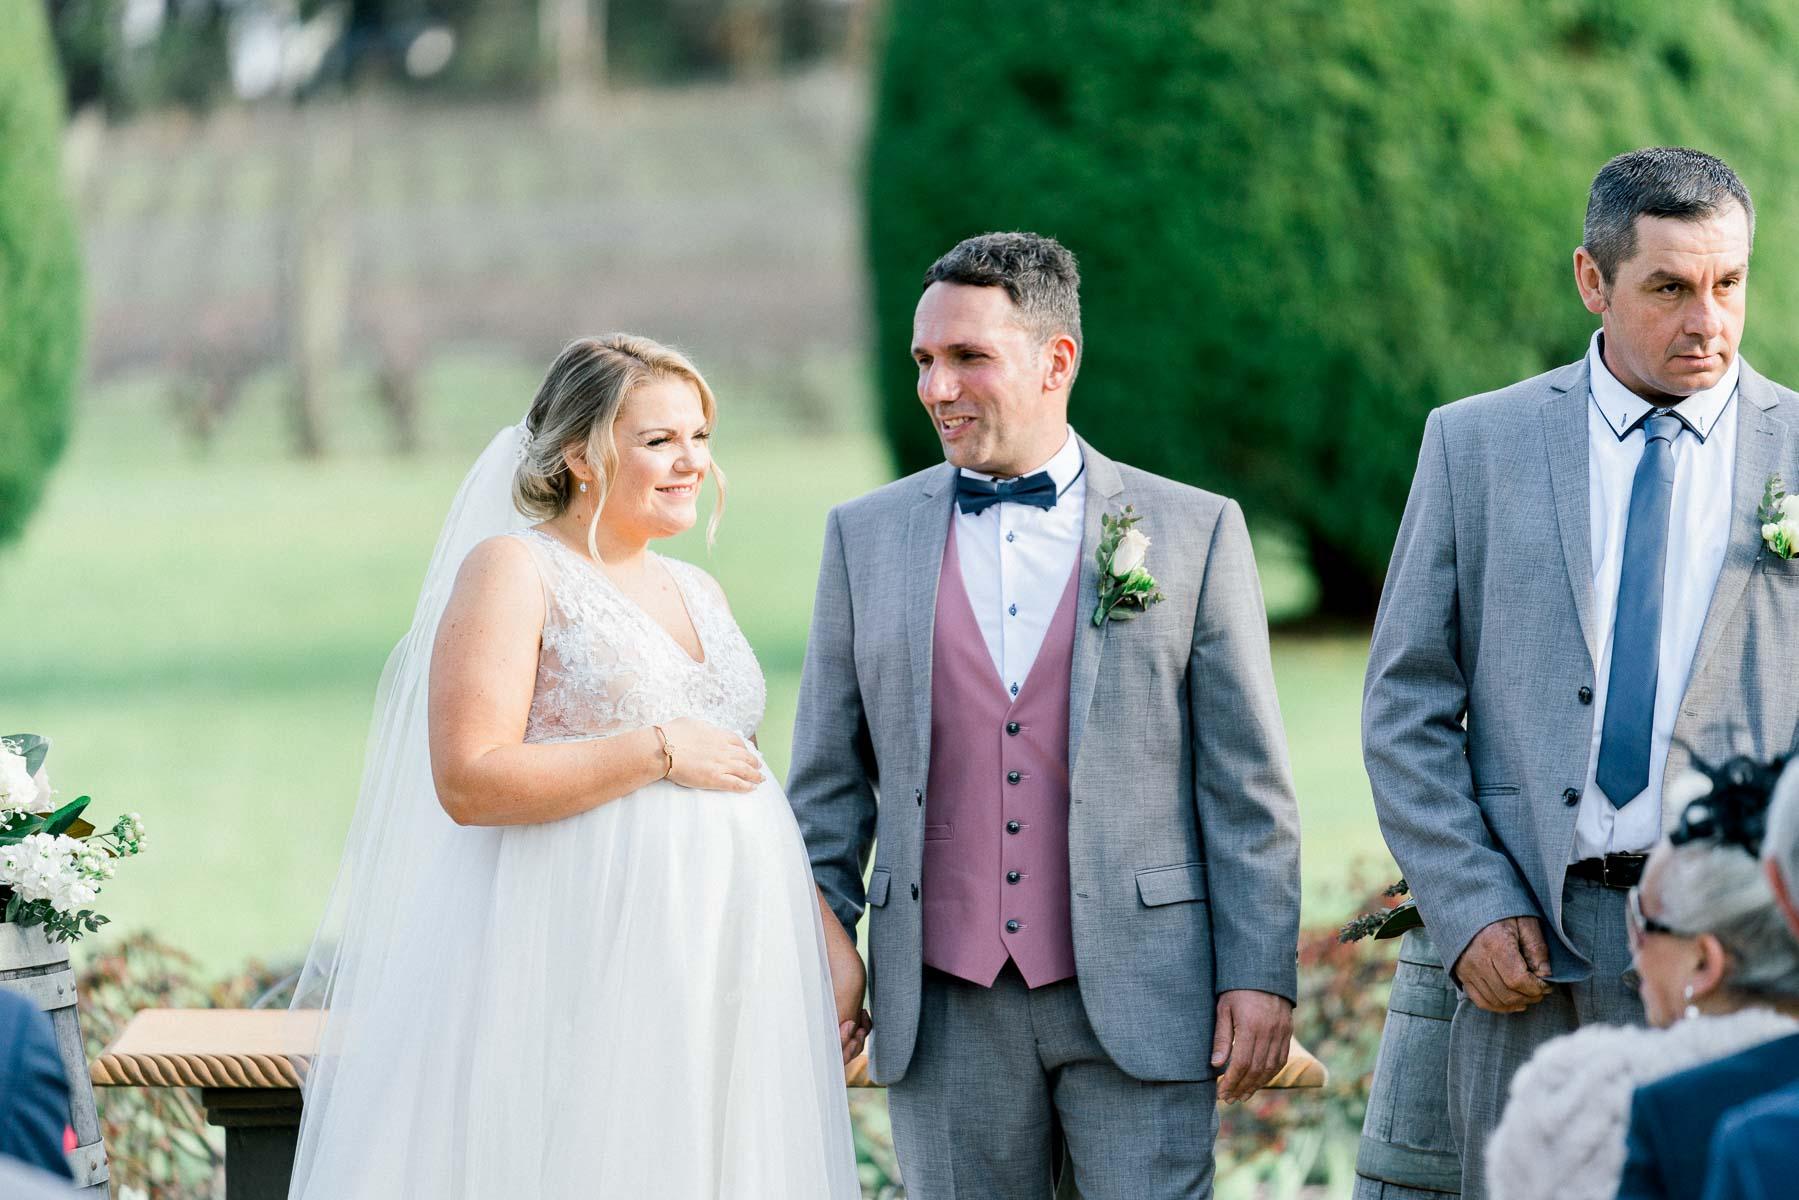 lindenderry-wedding-heart+soul-weddings-amy-alain-03281.jpg